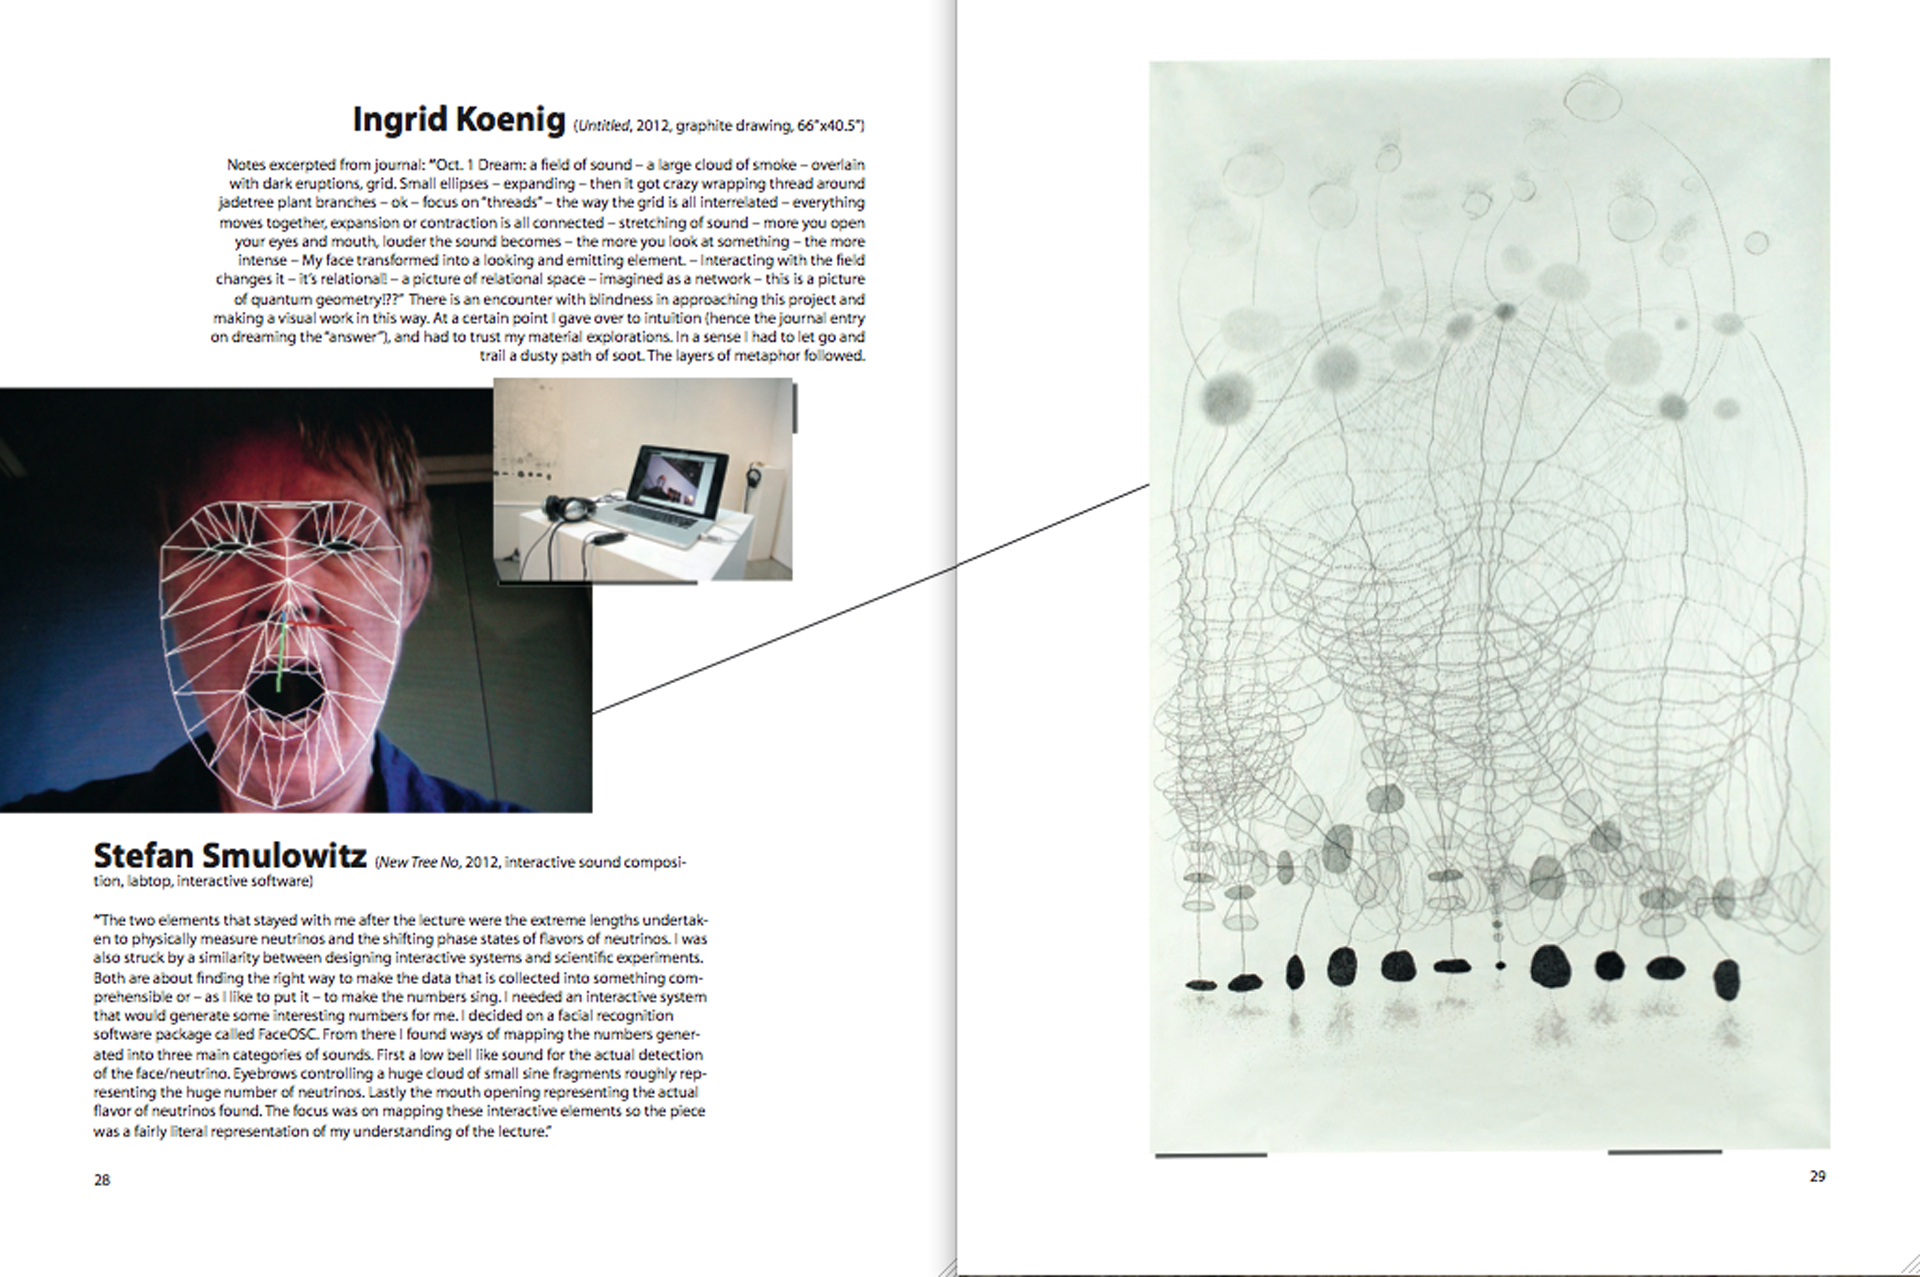 Stefan Smulovitz' work transferred to Ingrid Koenig for response